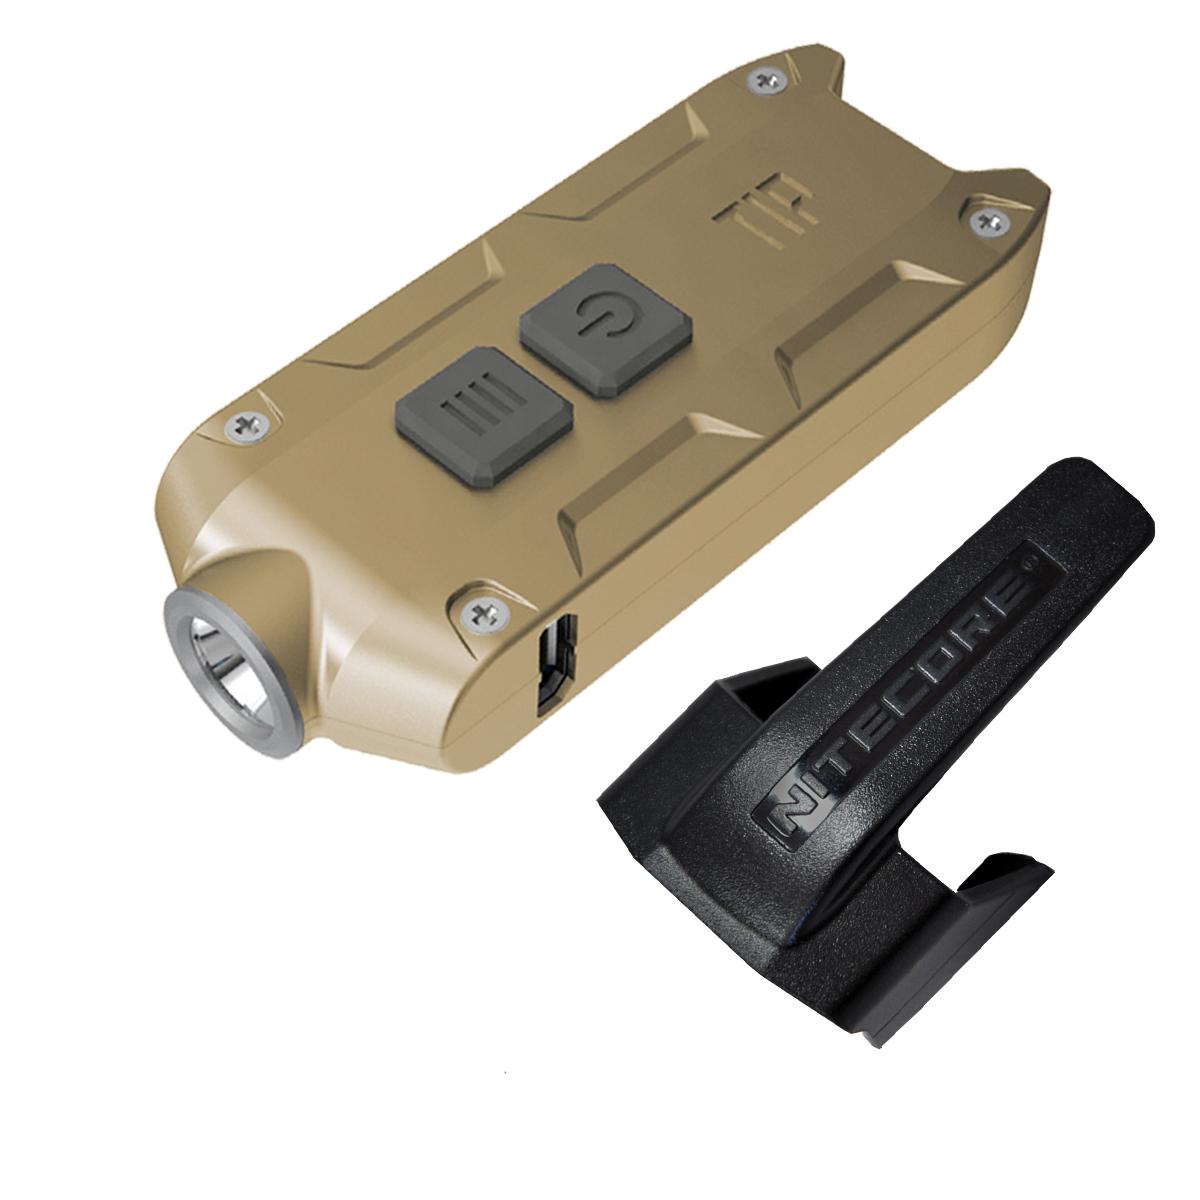 Nitecore Tip 2017 360 Lumen Rechargeable Keychain Flashlight (gold)